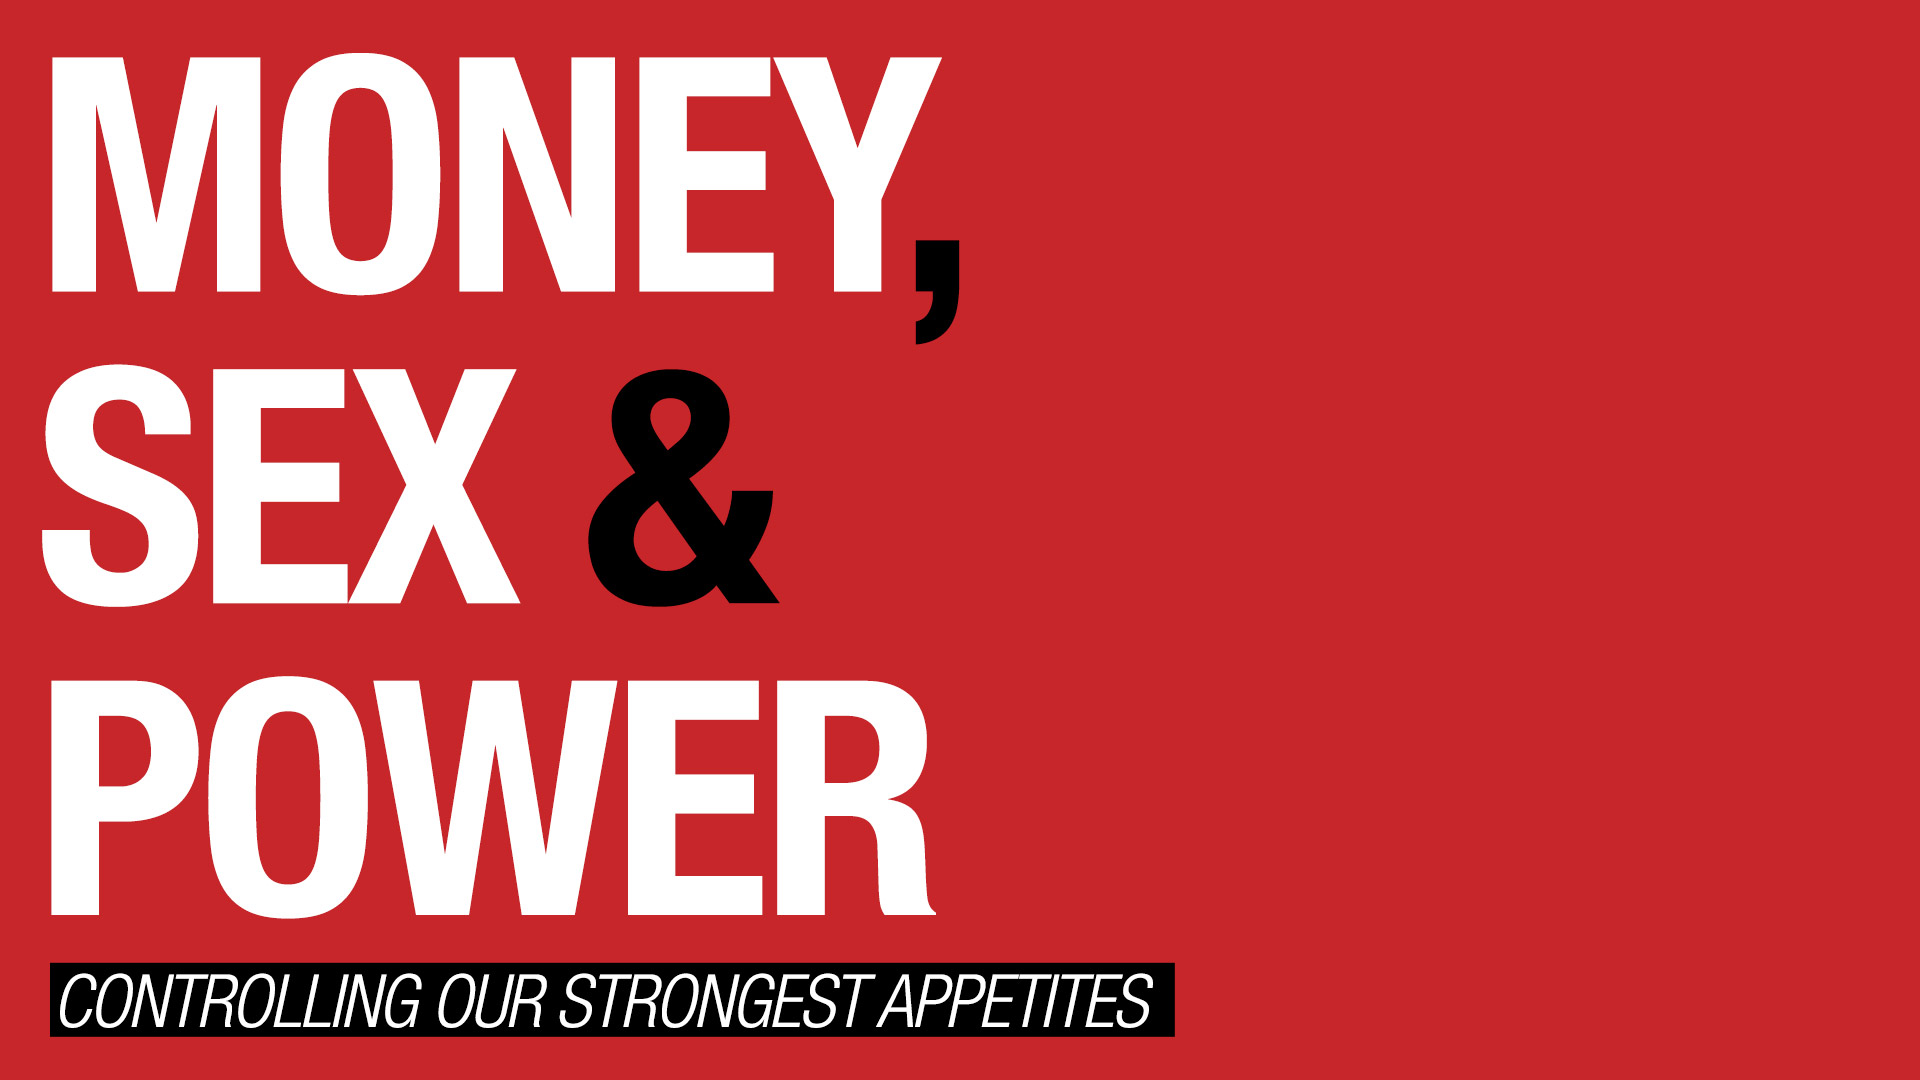 Money, Sex, & Power